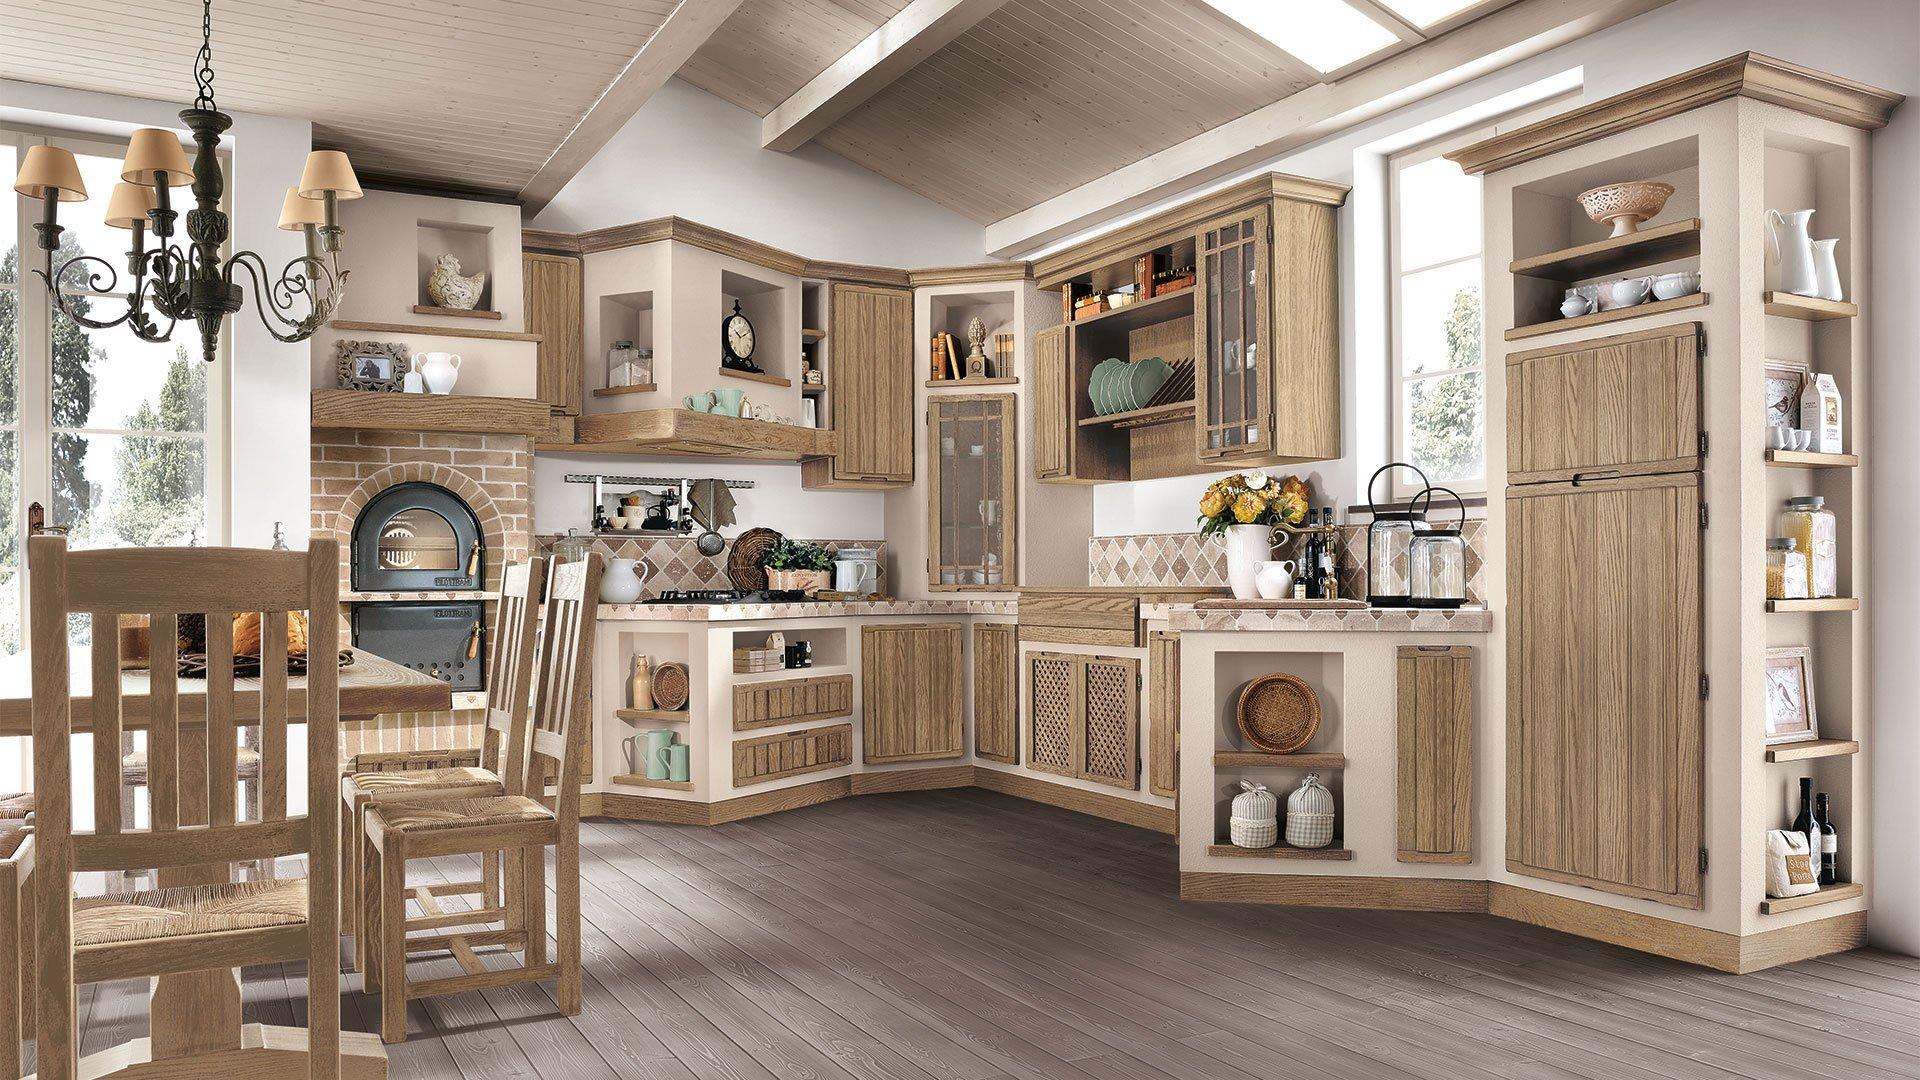 Cucina elena borgo antico vissani casa - Cucine finta muratura lube ...